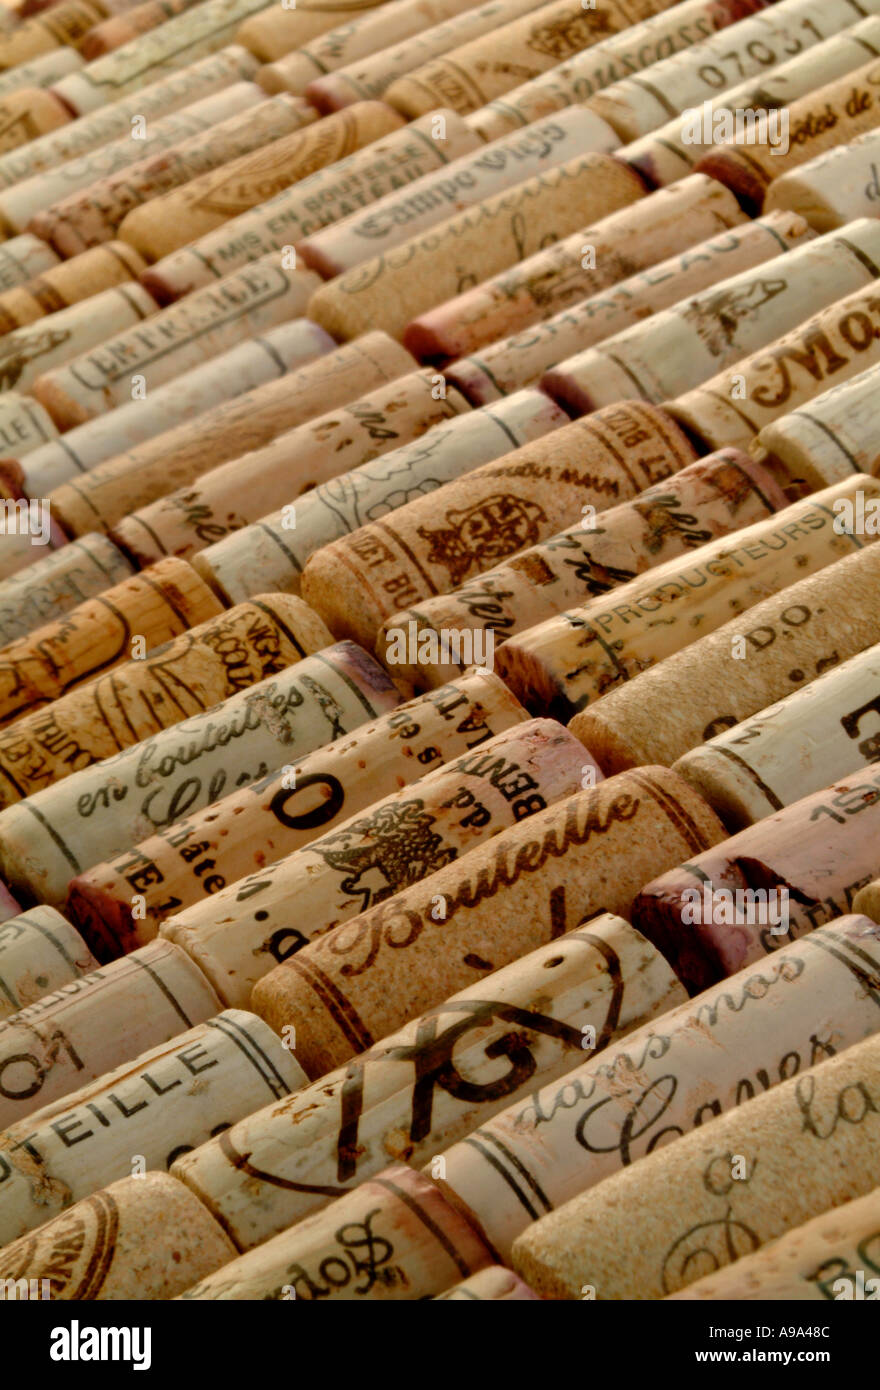 Corchos de vino tinto Imagen De Stock